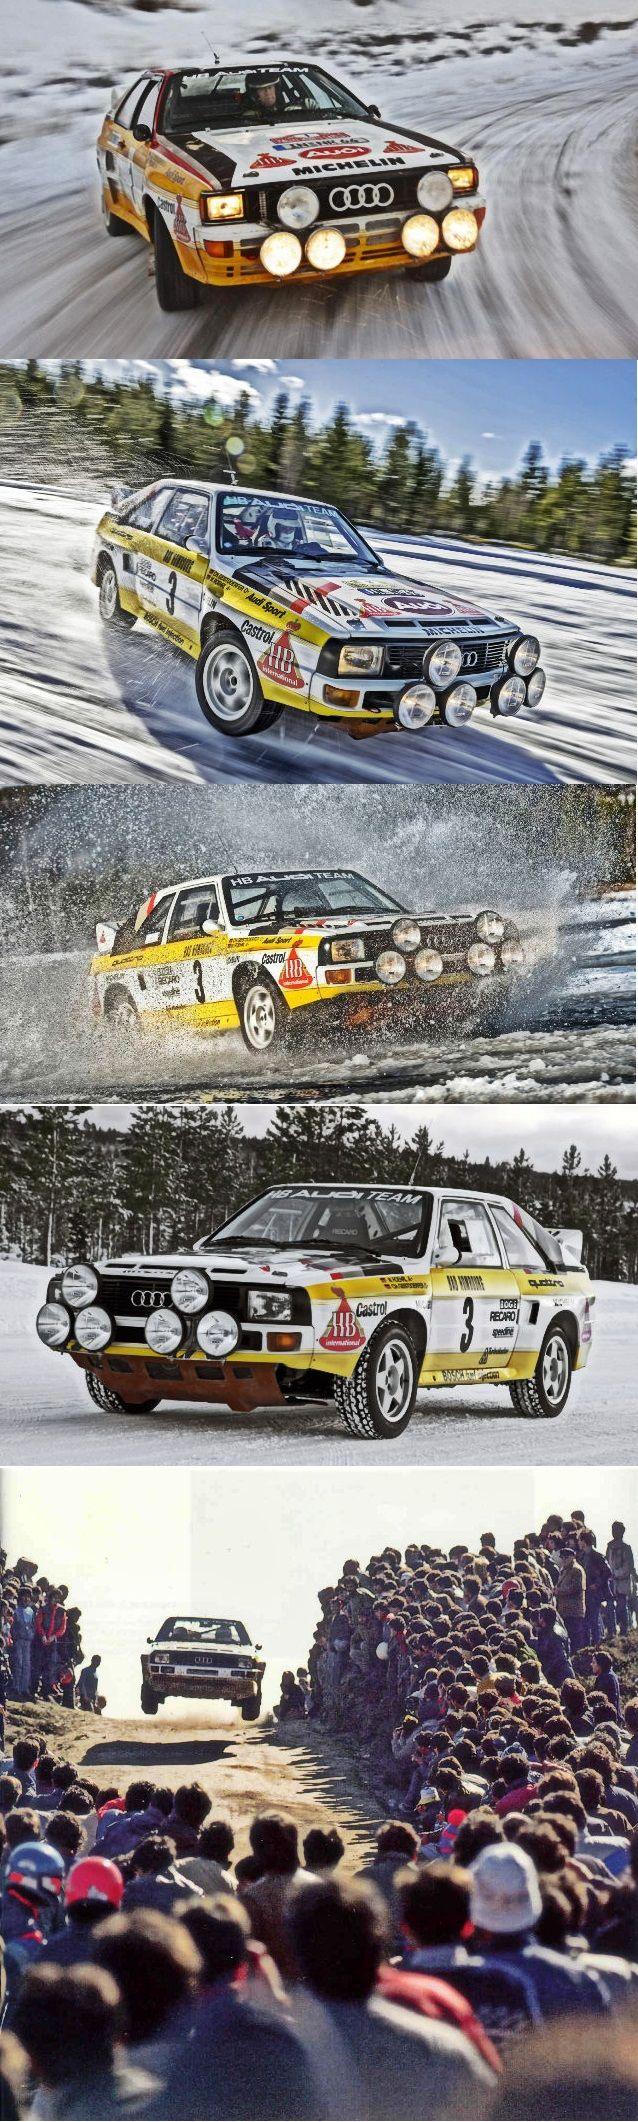 —- Classic  –  The Golden Era Of Group B Rally -  Audi Sport quattro S1 – http://krro.com.mx/